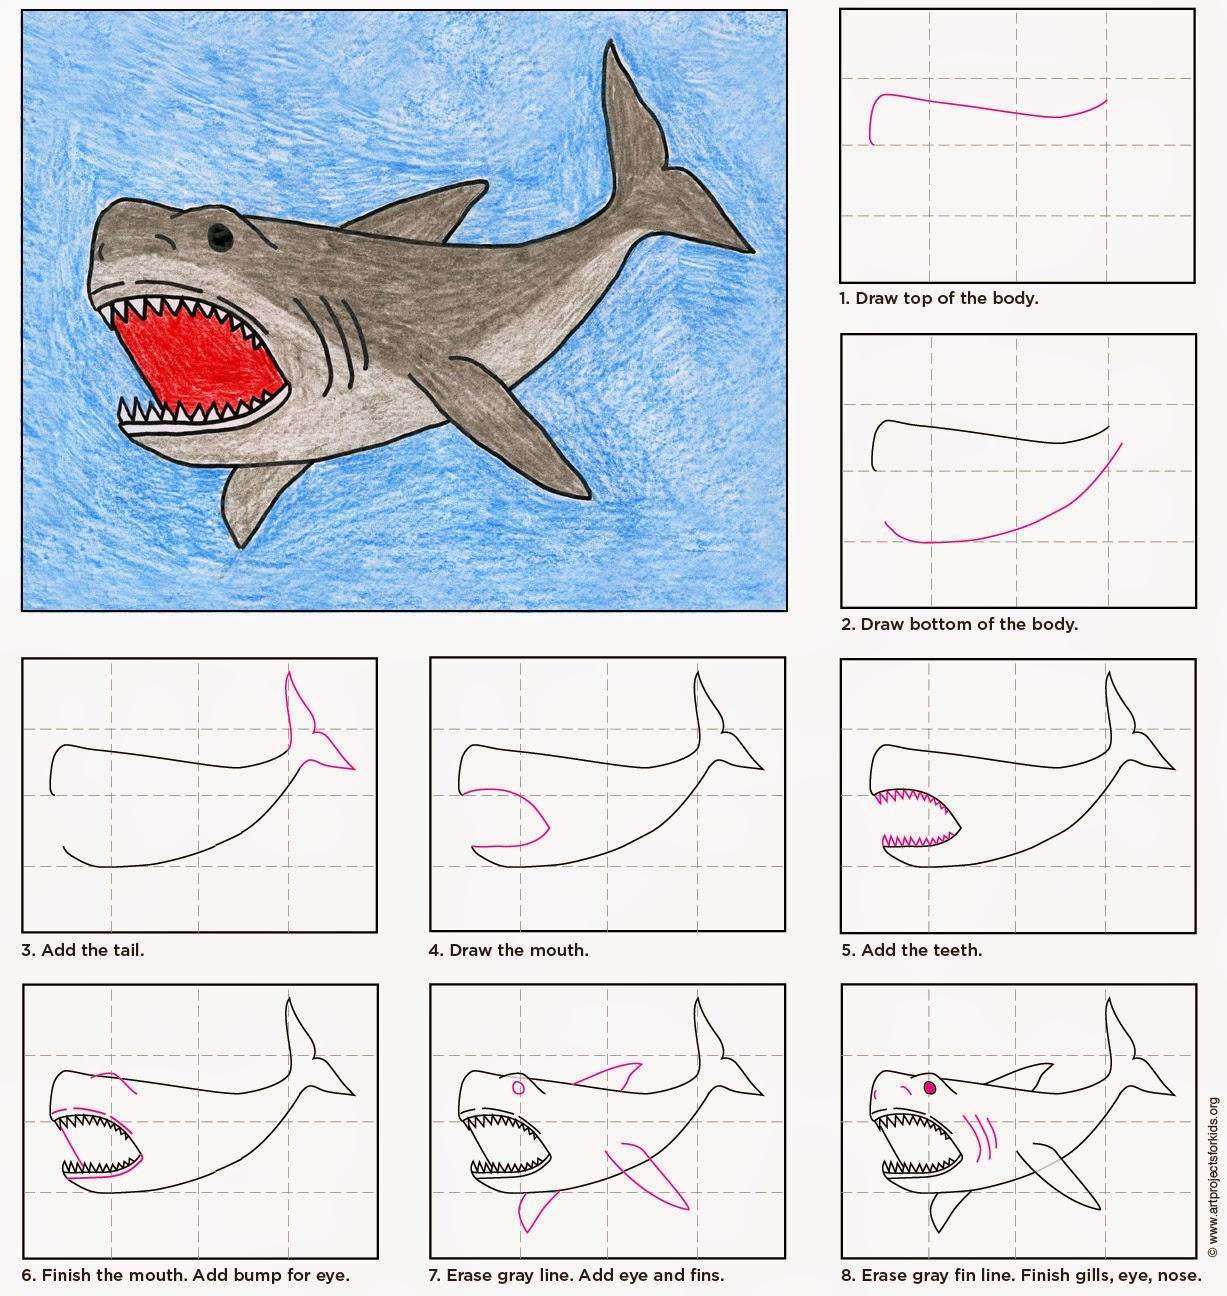 http://1.bp.blogspot.com/-olMe8ibLB4c/U9HN_ClwVwI/AAAAAAAAULw/fCWvfuulYzo/s1600/Megalodon+Shark+post.jpg